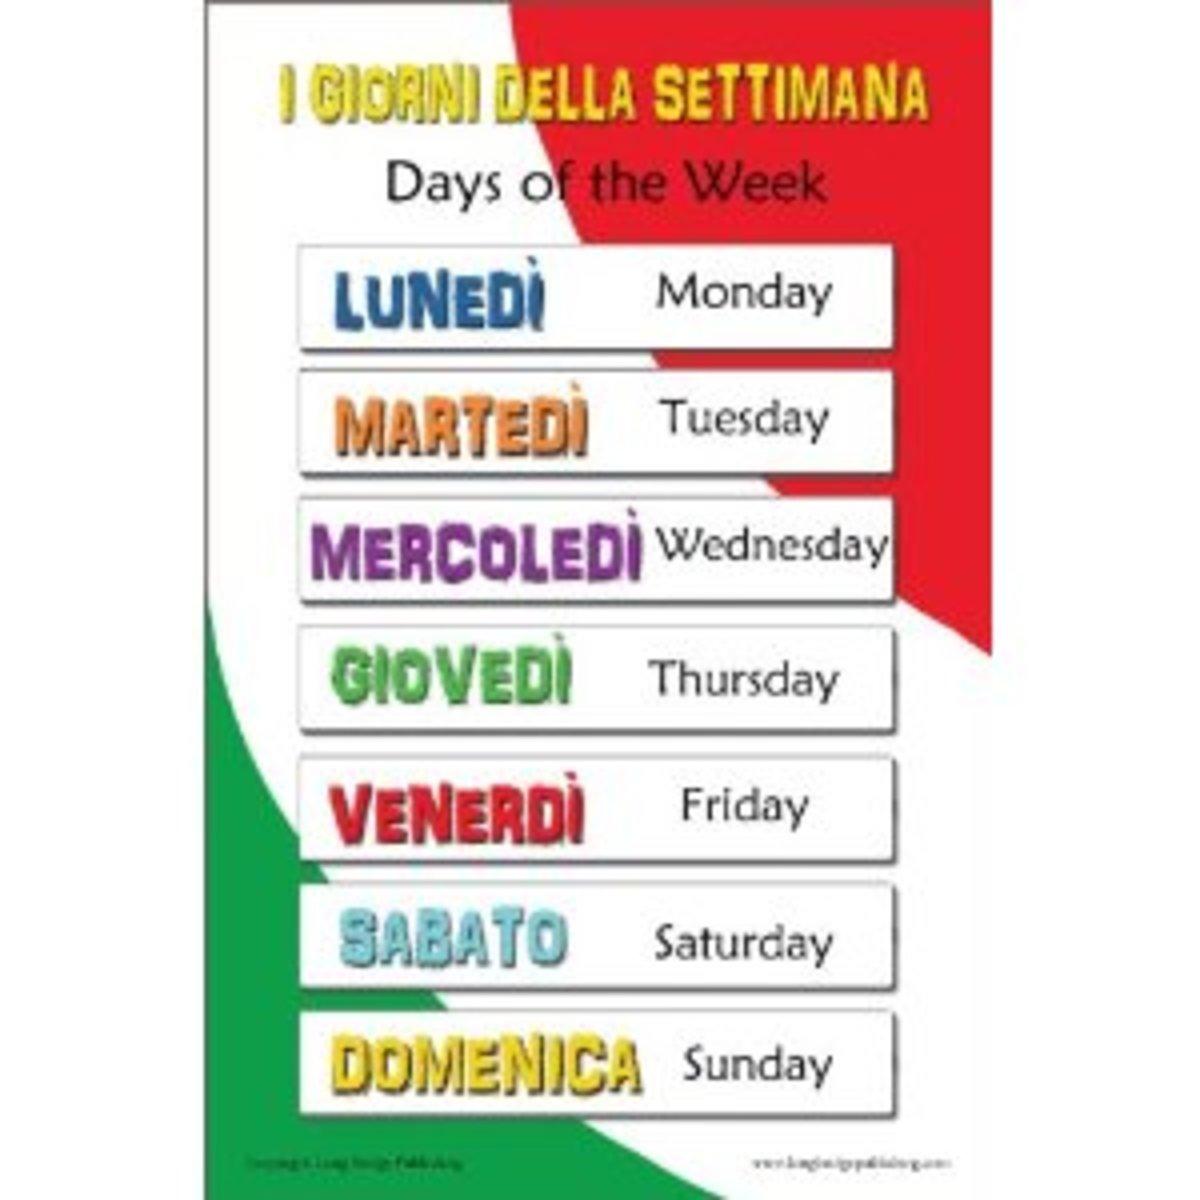 Common Italian Words and Phrases for Travelers | WanderWisdom